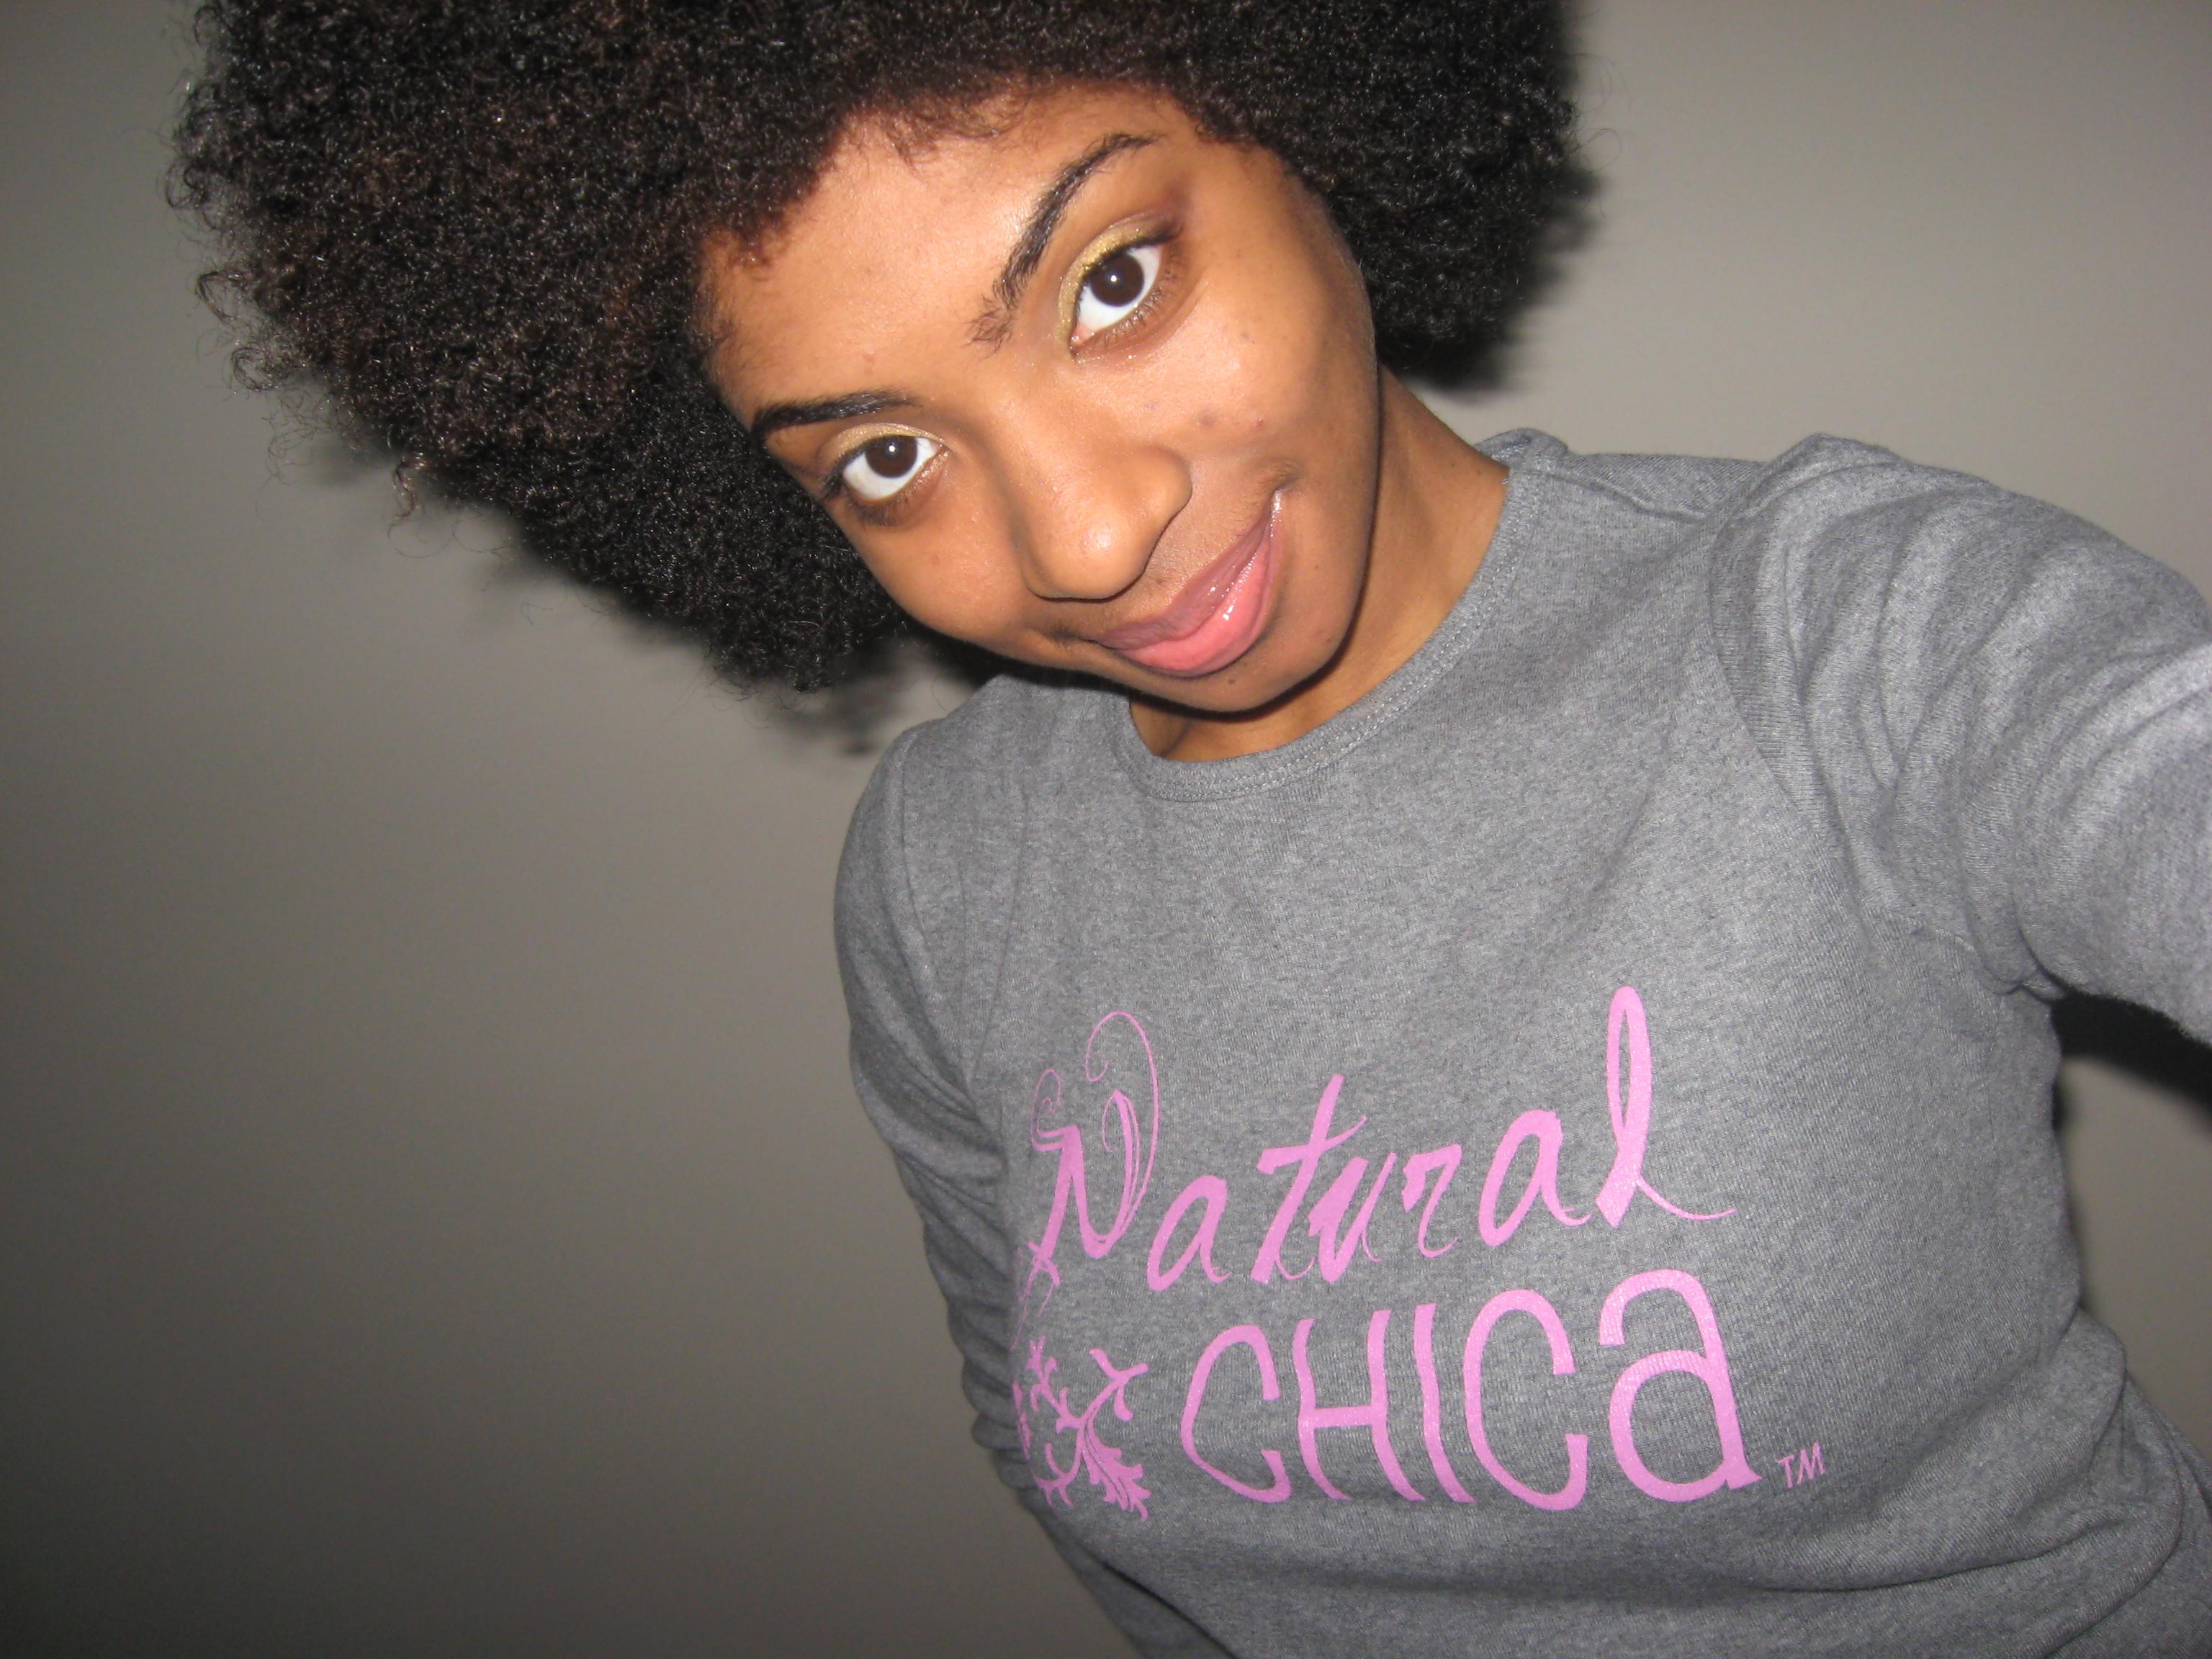 Custom T Shirts For Natural Chica Shirt Design Ideas